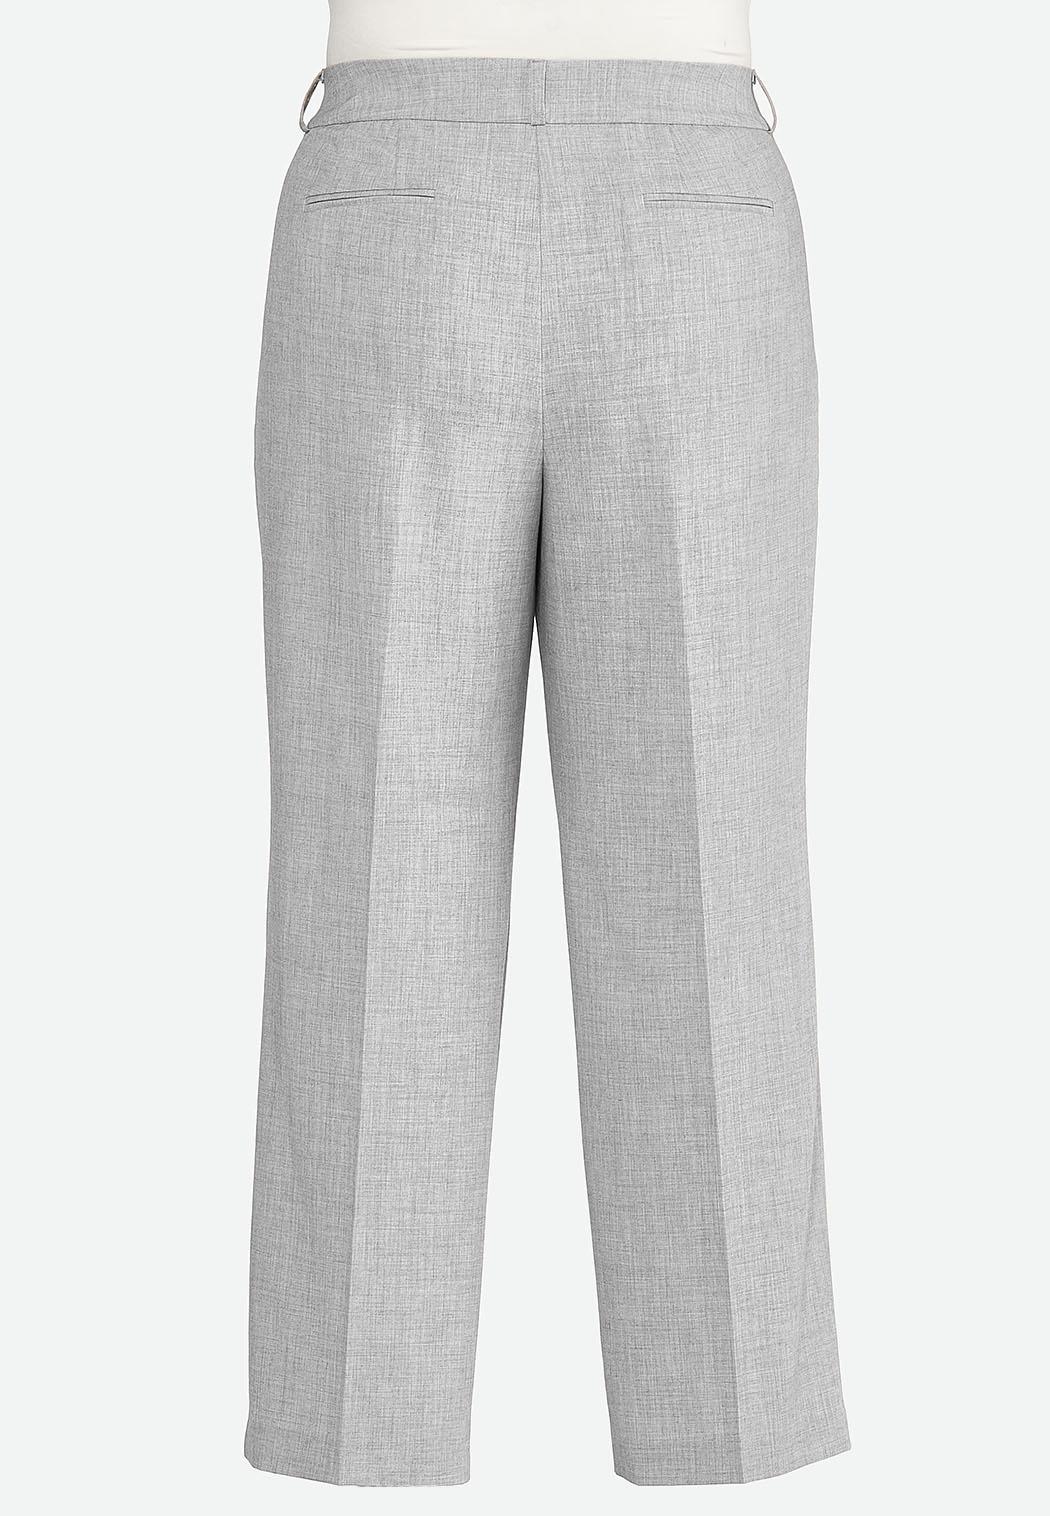 Plus Petite Trouser Pants (Item #44474616)